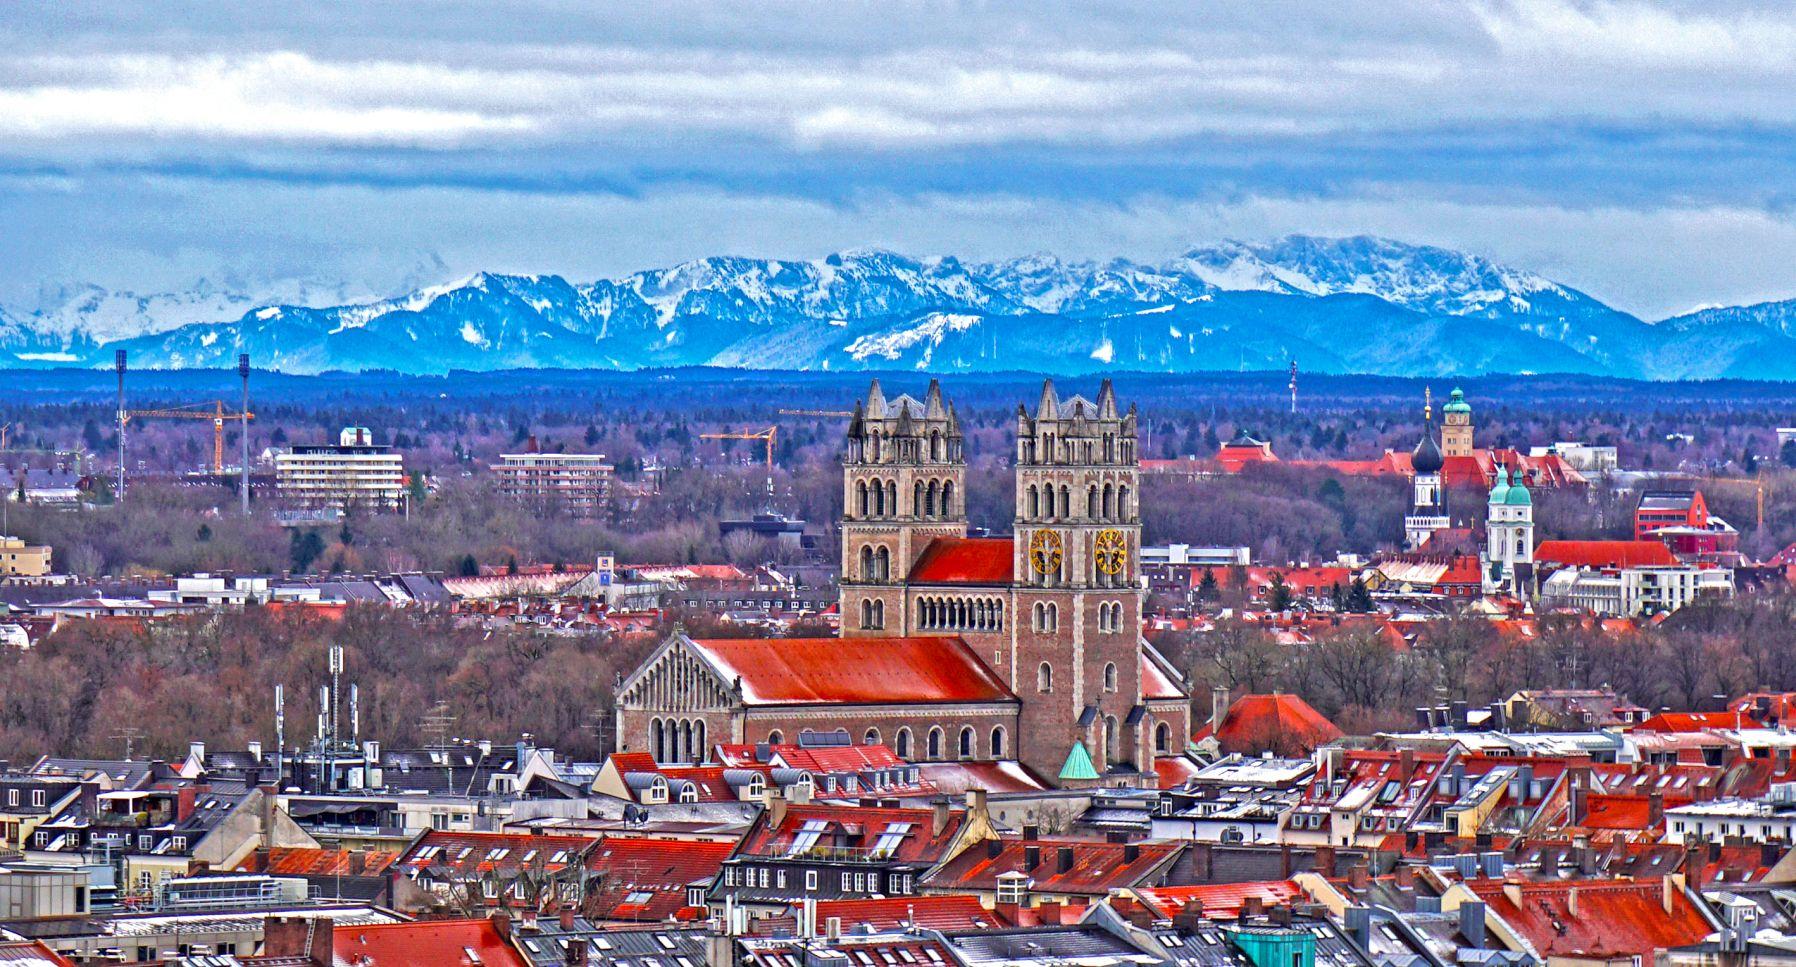 Sankt Maximilian München mit Blick auf Alpen bei Föhn Wetter